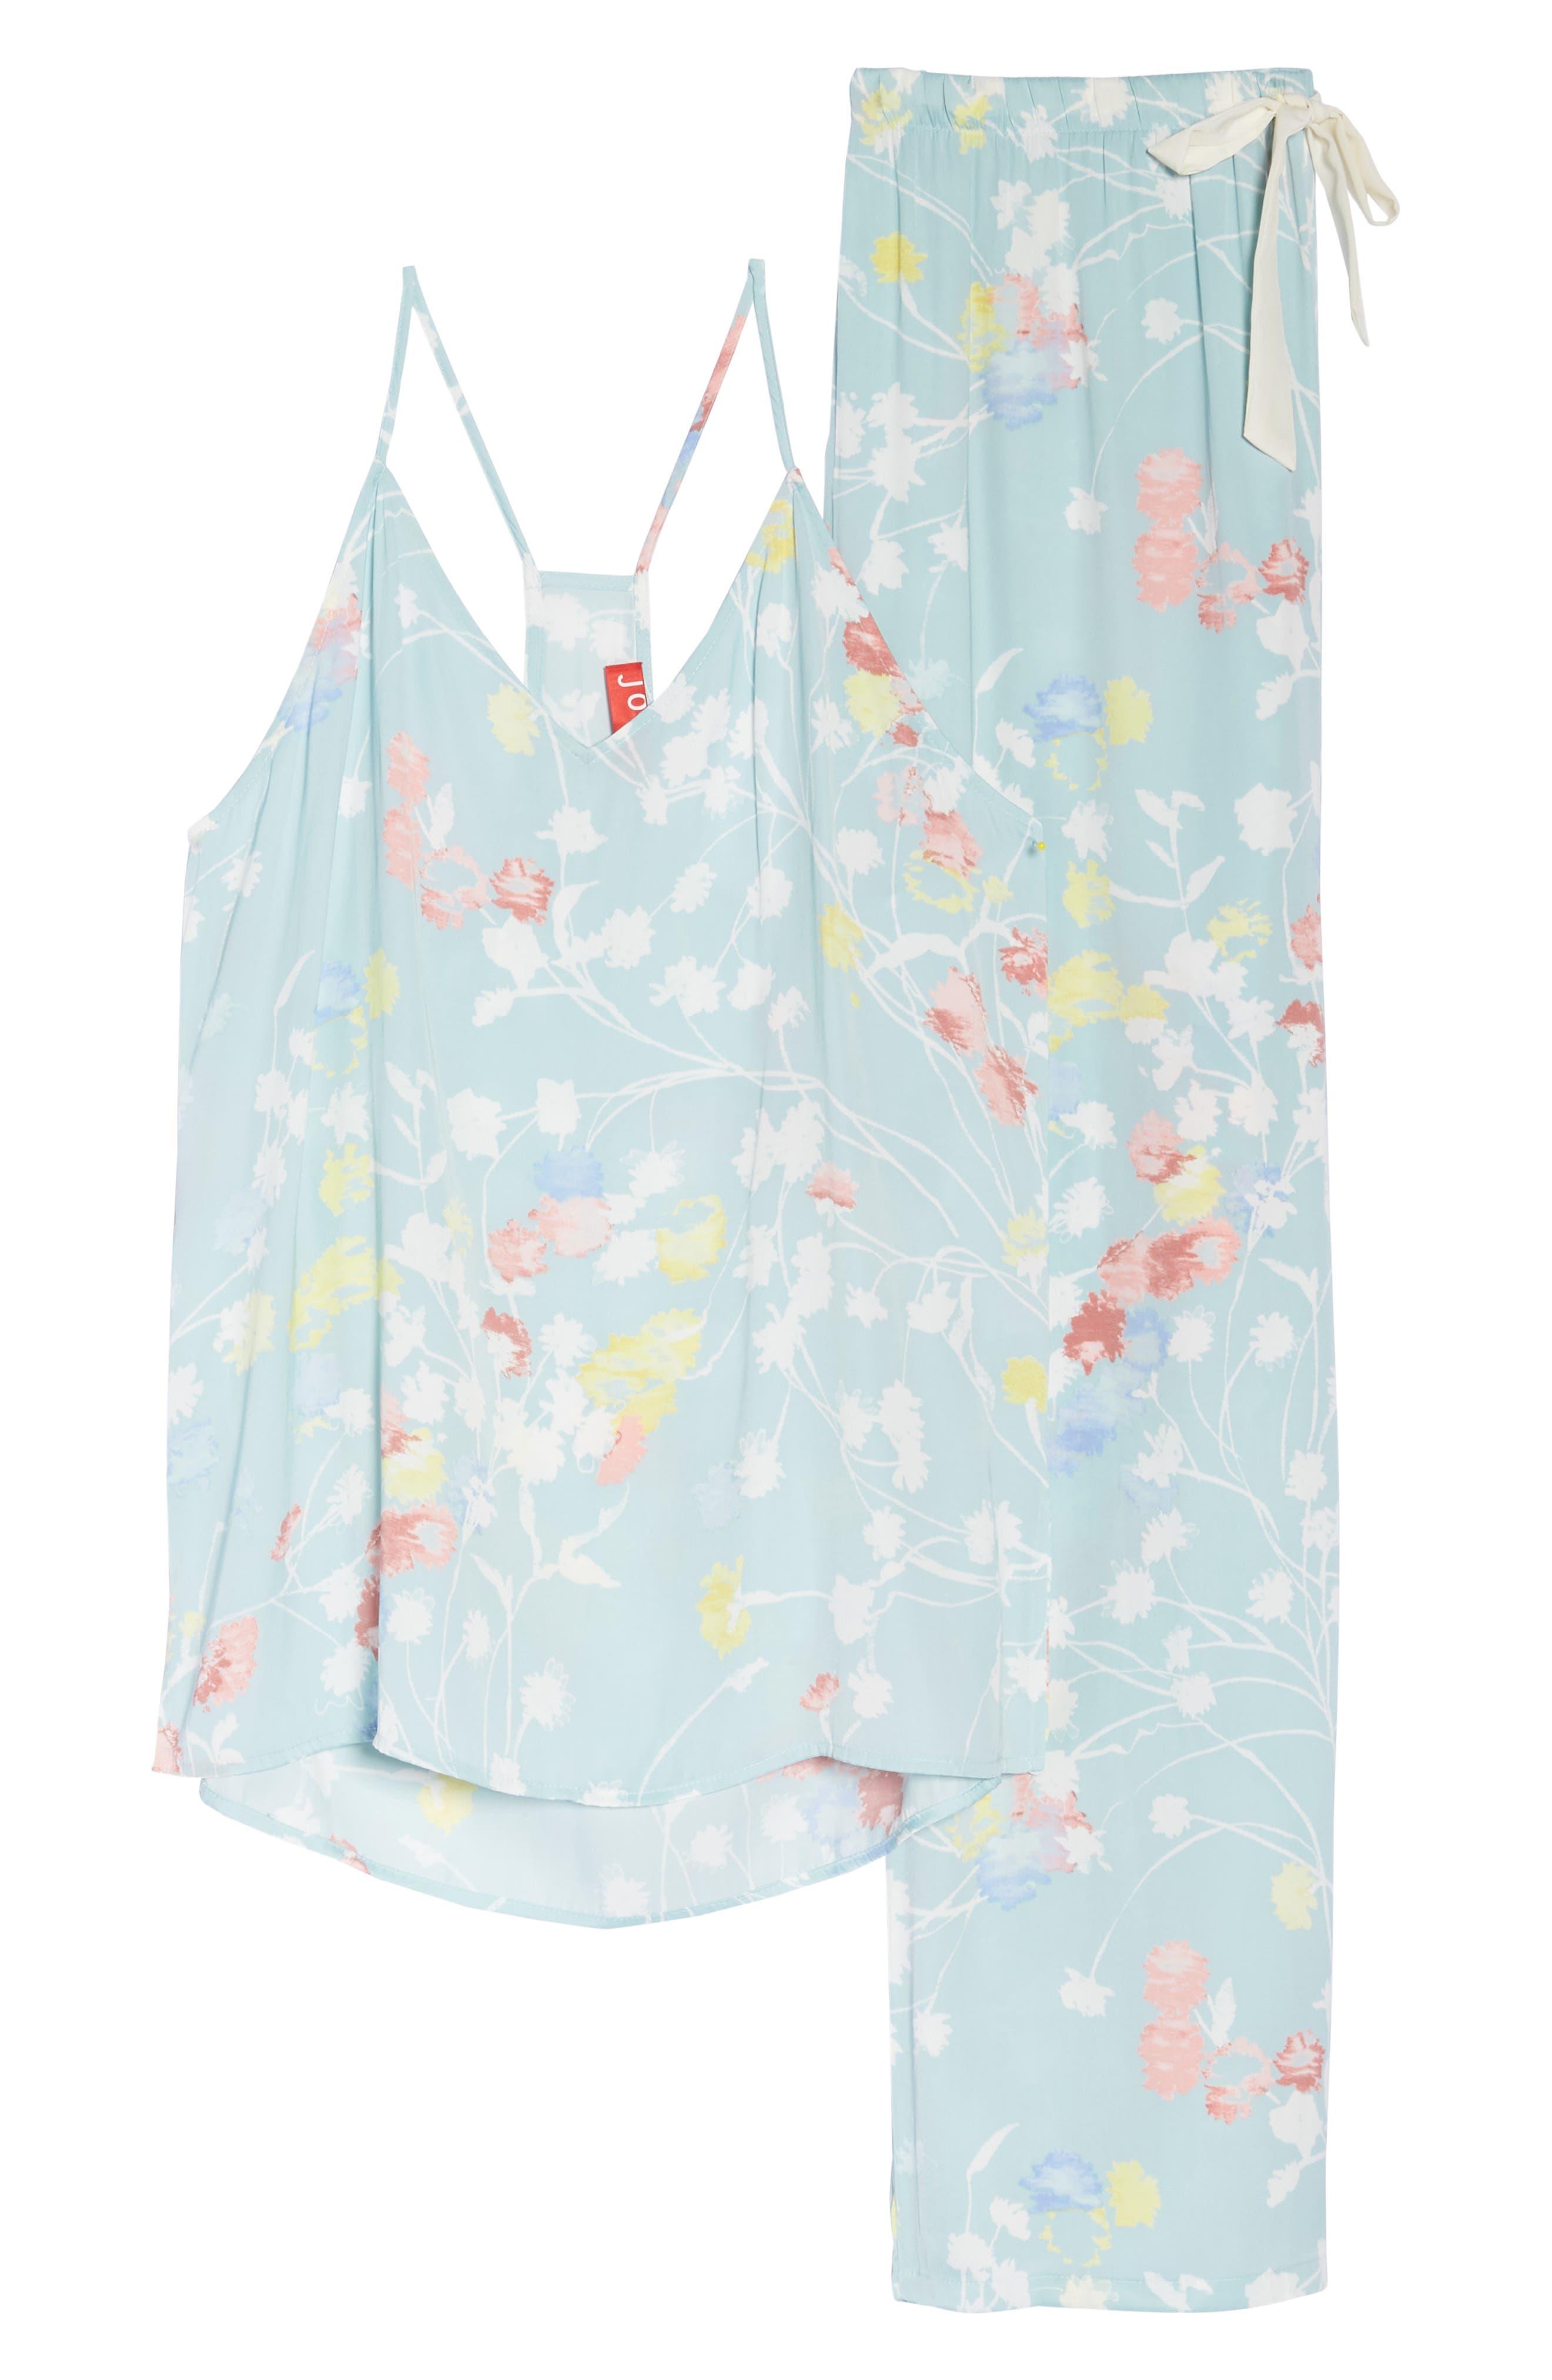 Bardot Dreamland Pajamas,                             Alternate thumbnail 4, color,                             Sgb Seaglass